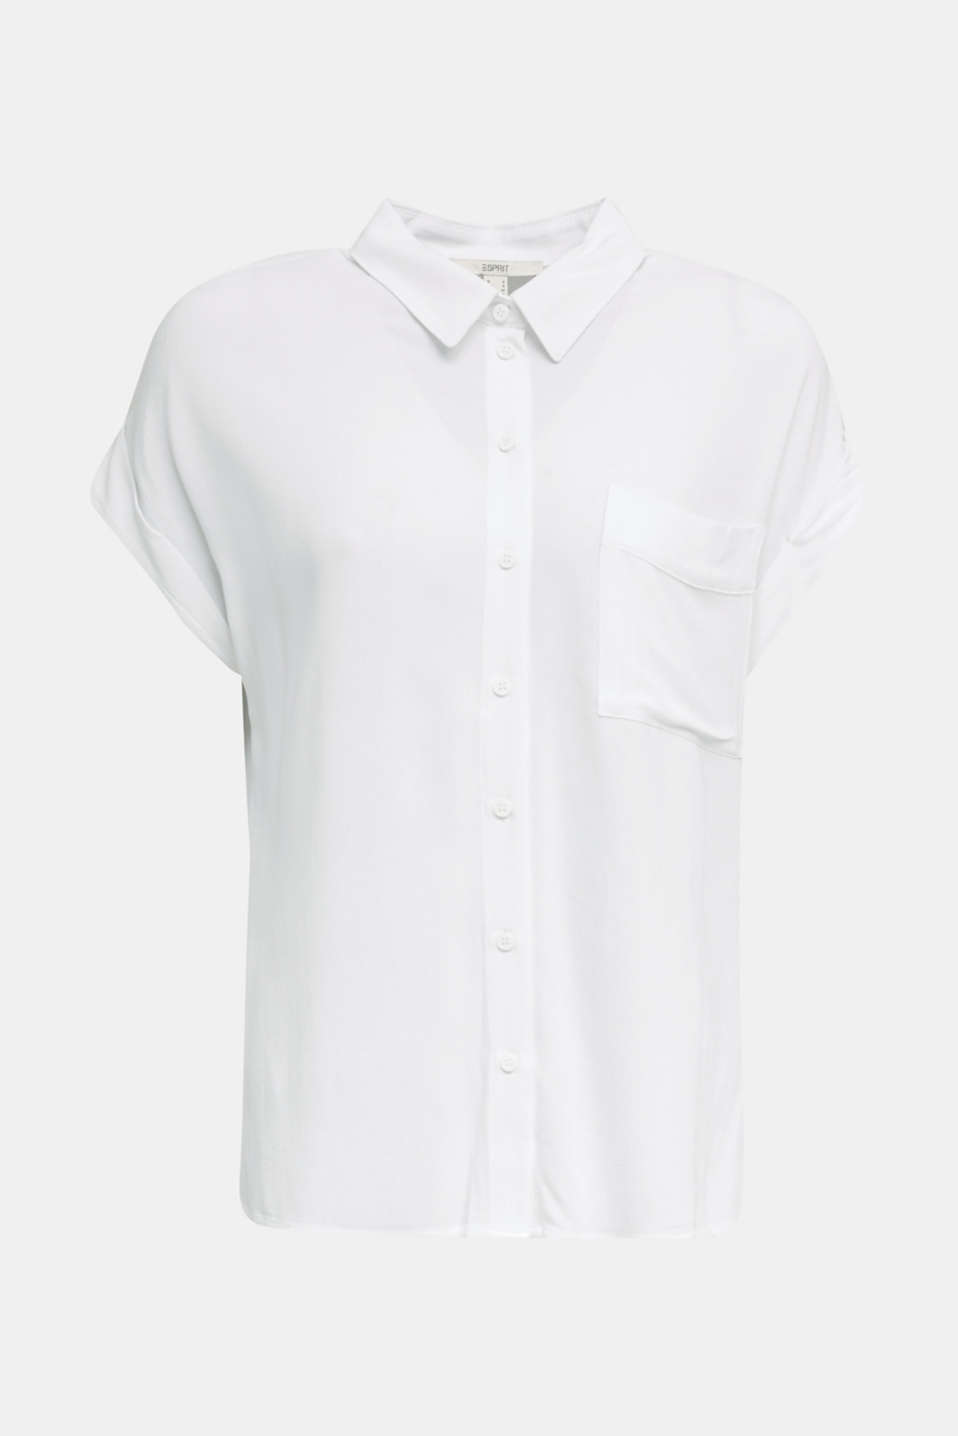 Crêpe blouse top, WHITE, detail image number 7